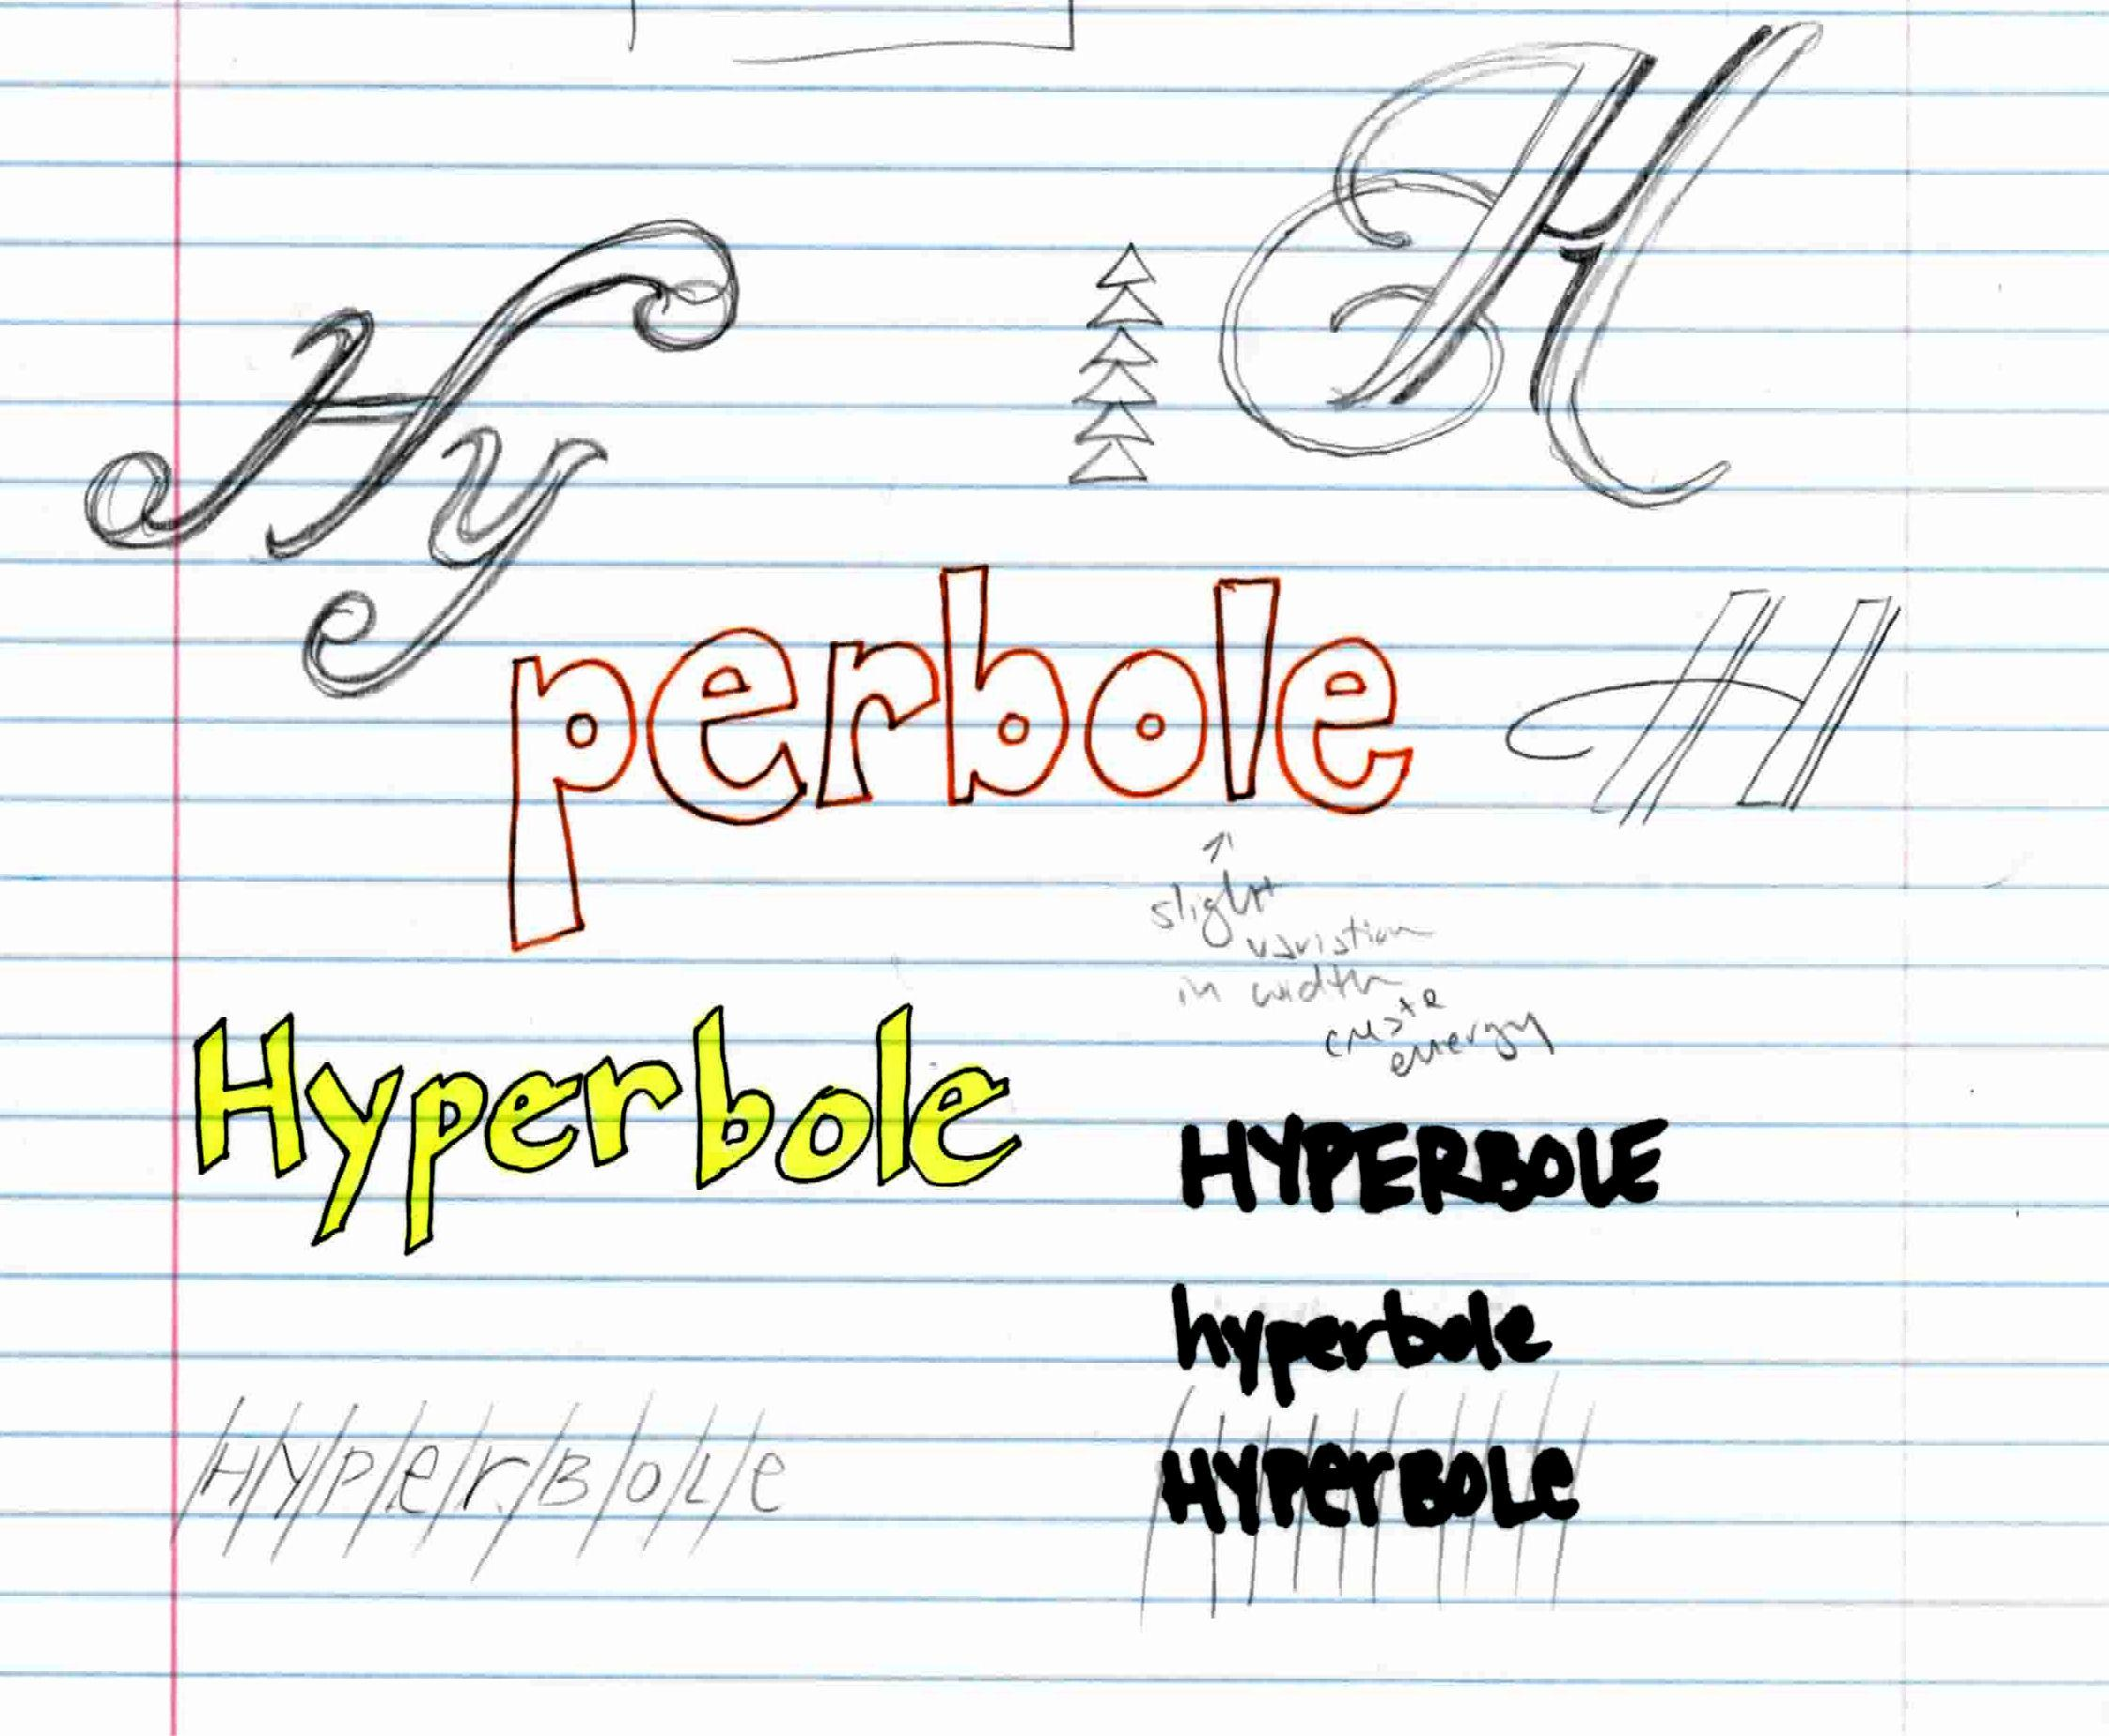 Hyperbole - image 10 - student project